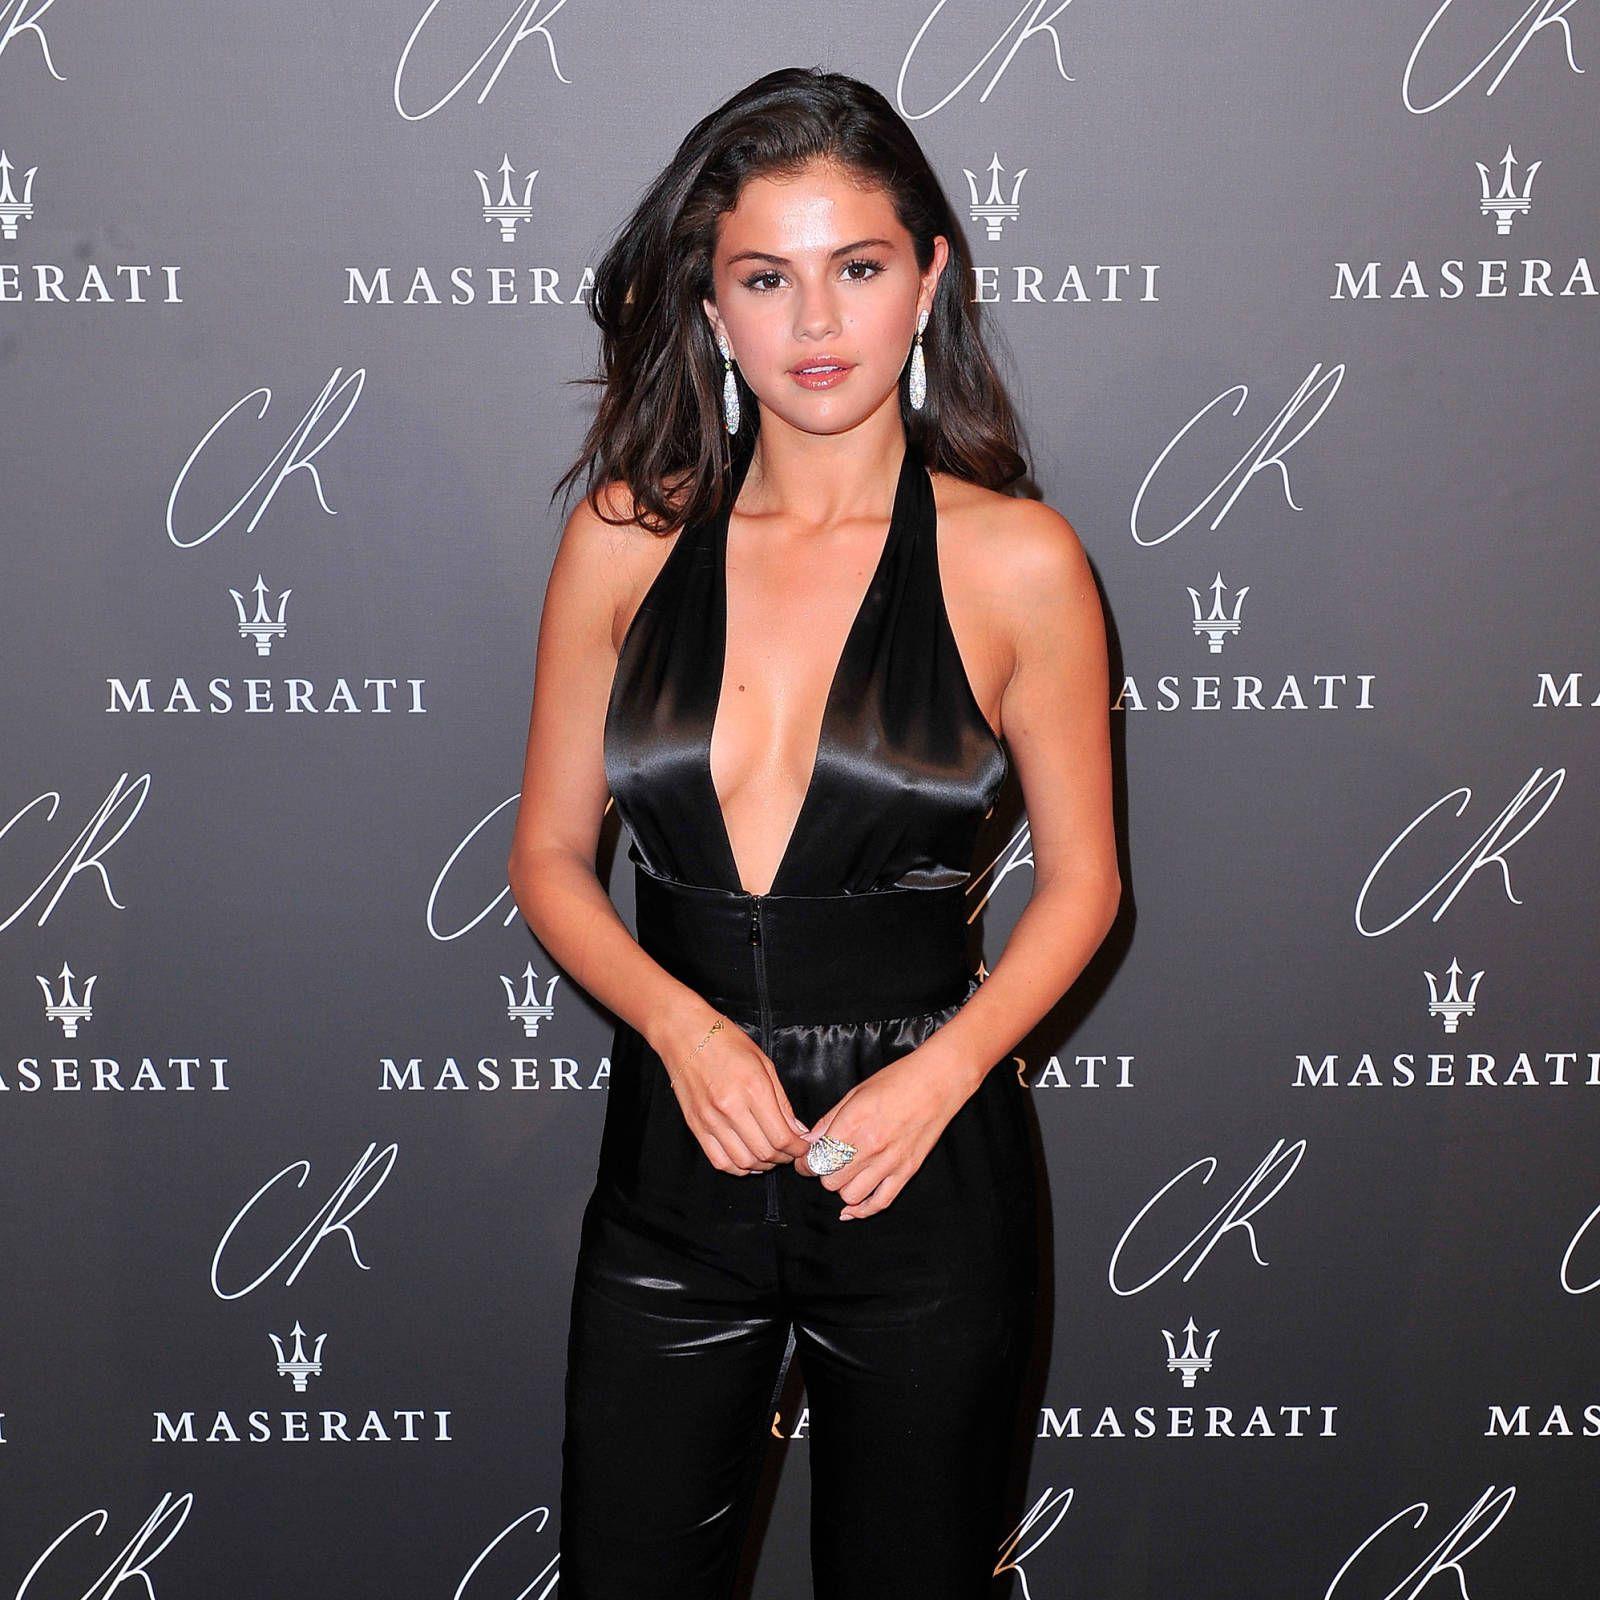 Selena Gomez at the CR Fashion Book launch